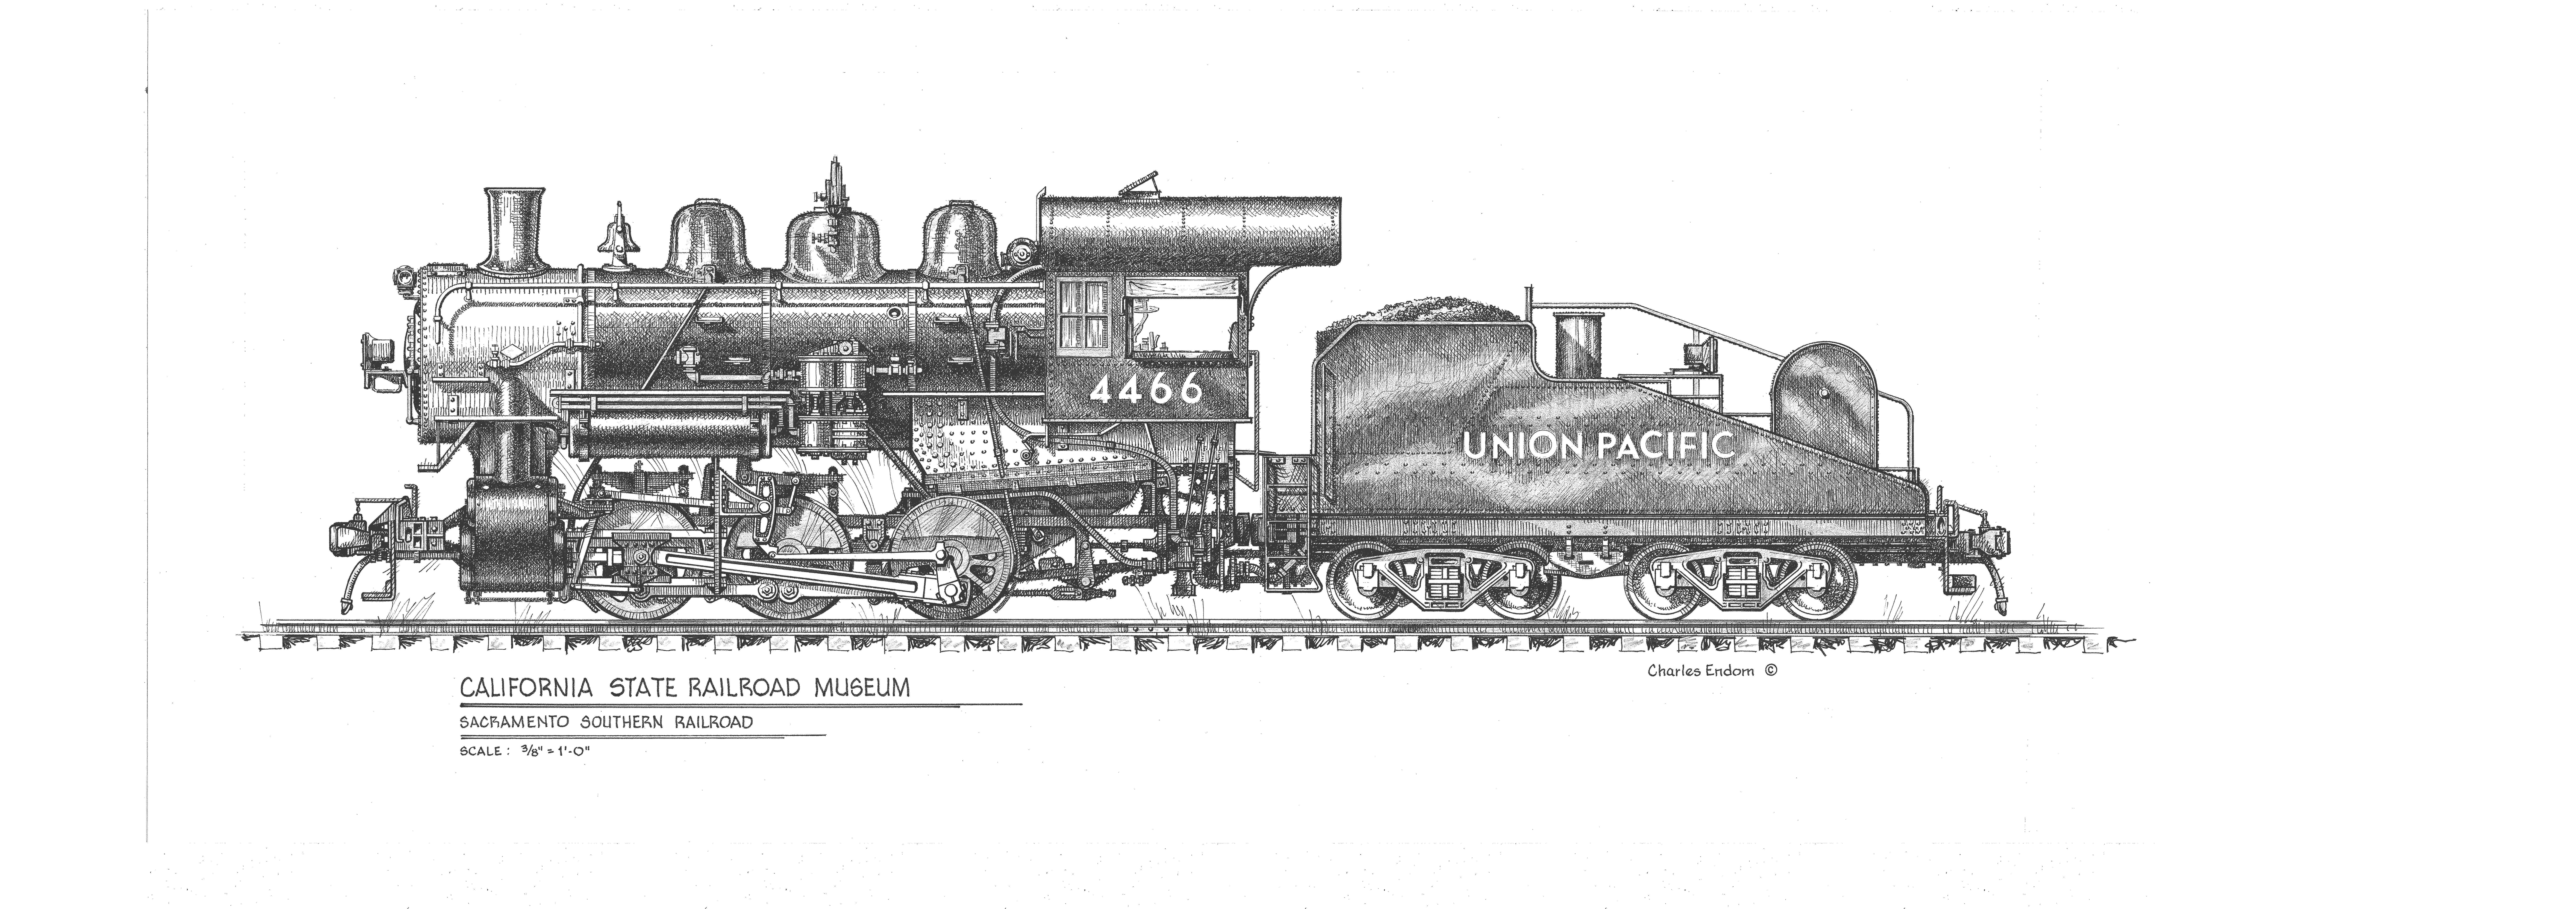 Union Pacific 4466 Steam Train Engine Pen Ink Illustration By C Endom California State Railroad Museum Railroad History Steam Shop